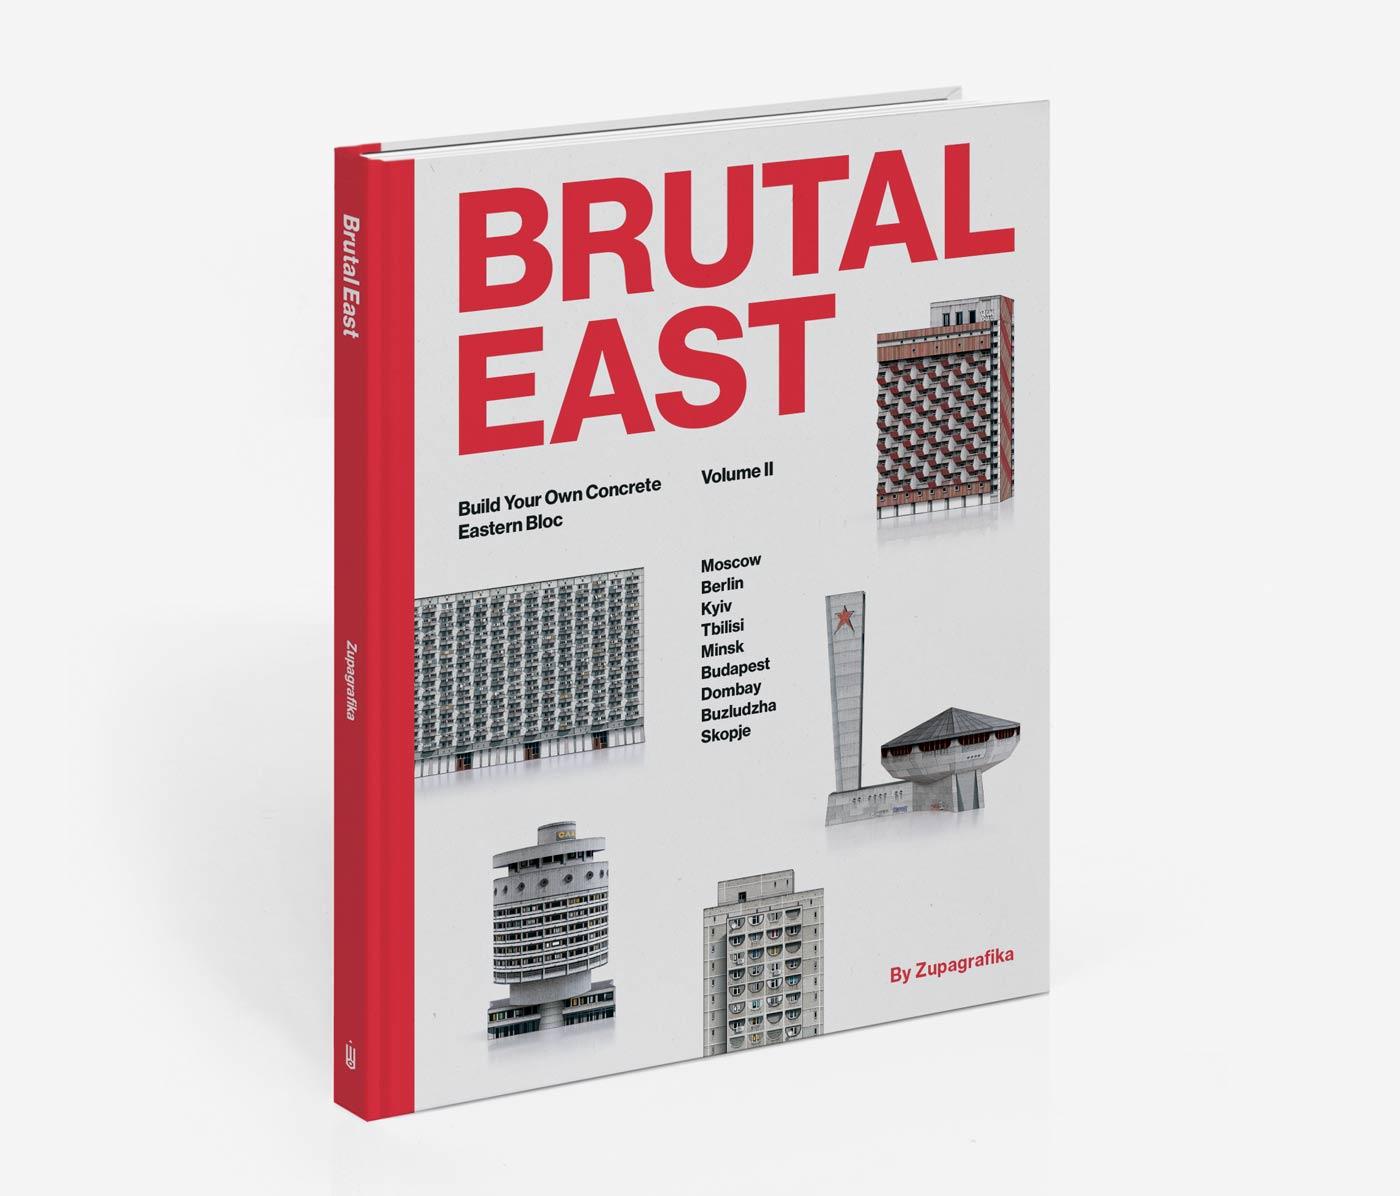 Brutal East: Volume II